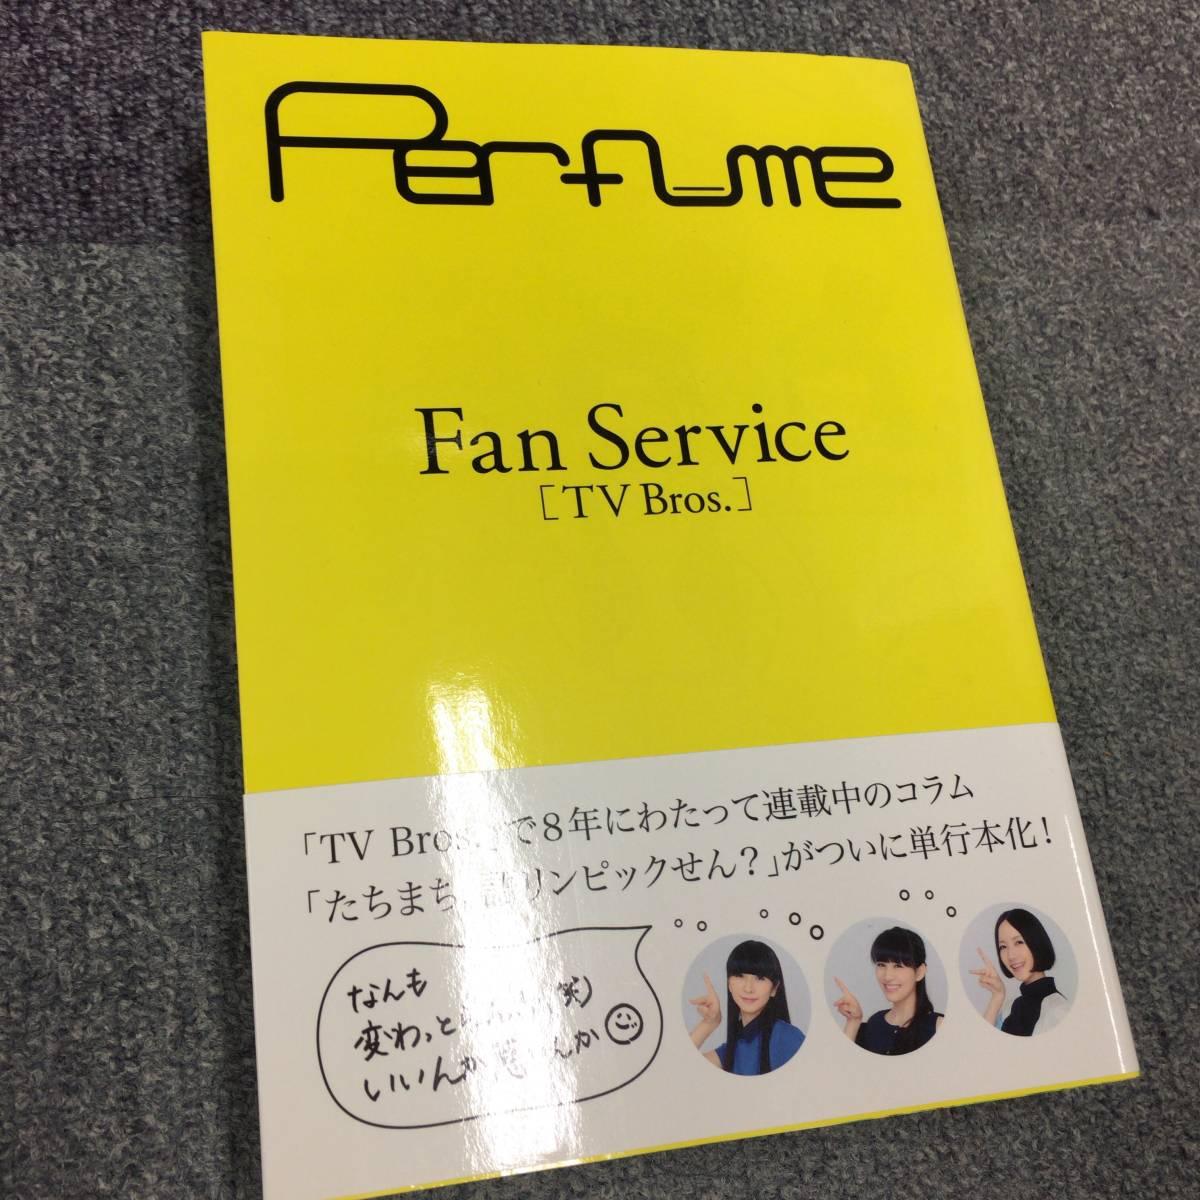 Perfume Fan Service [TV Bros.] 通常版 ライブグッズの画像